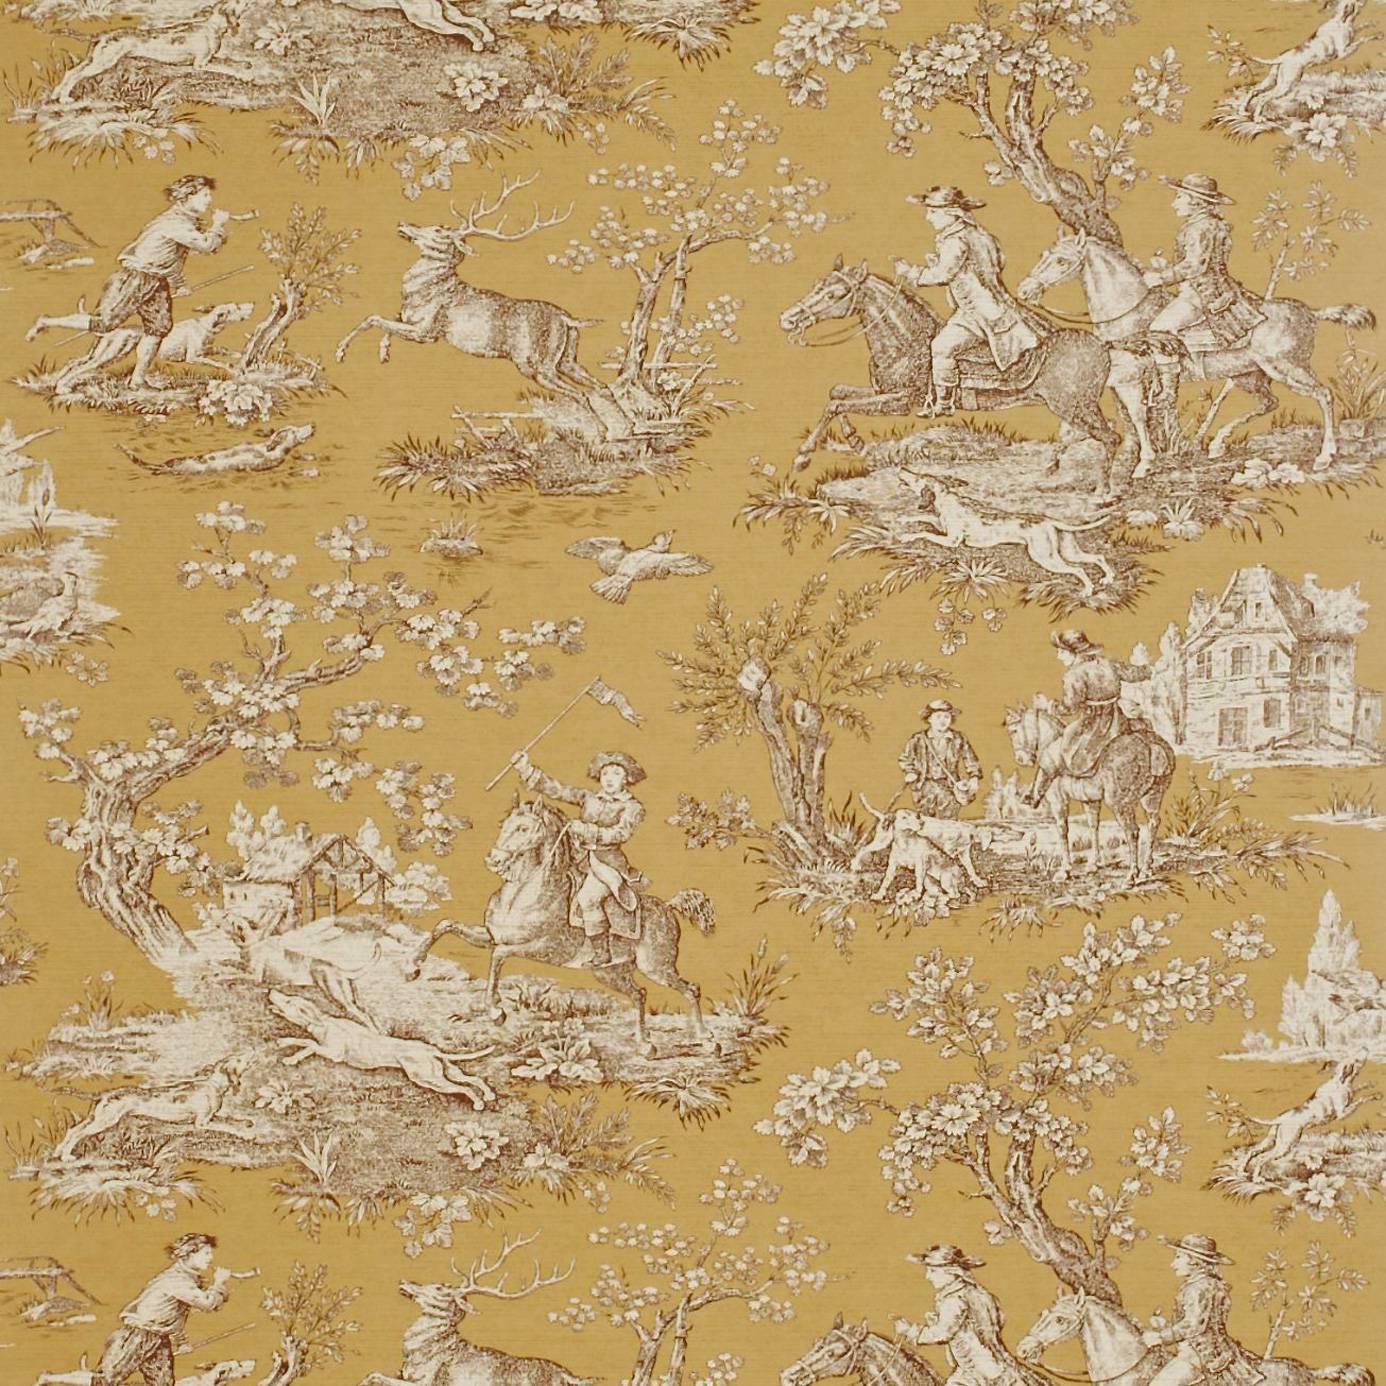 Stag Hunting Wallpaper Caramel Charcoal Degtst104